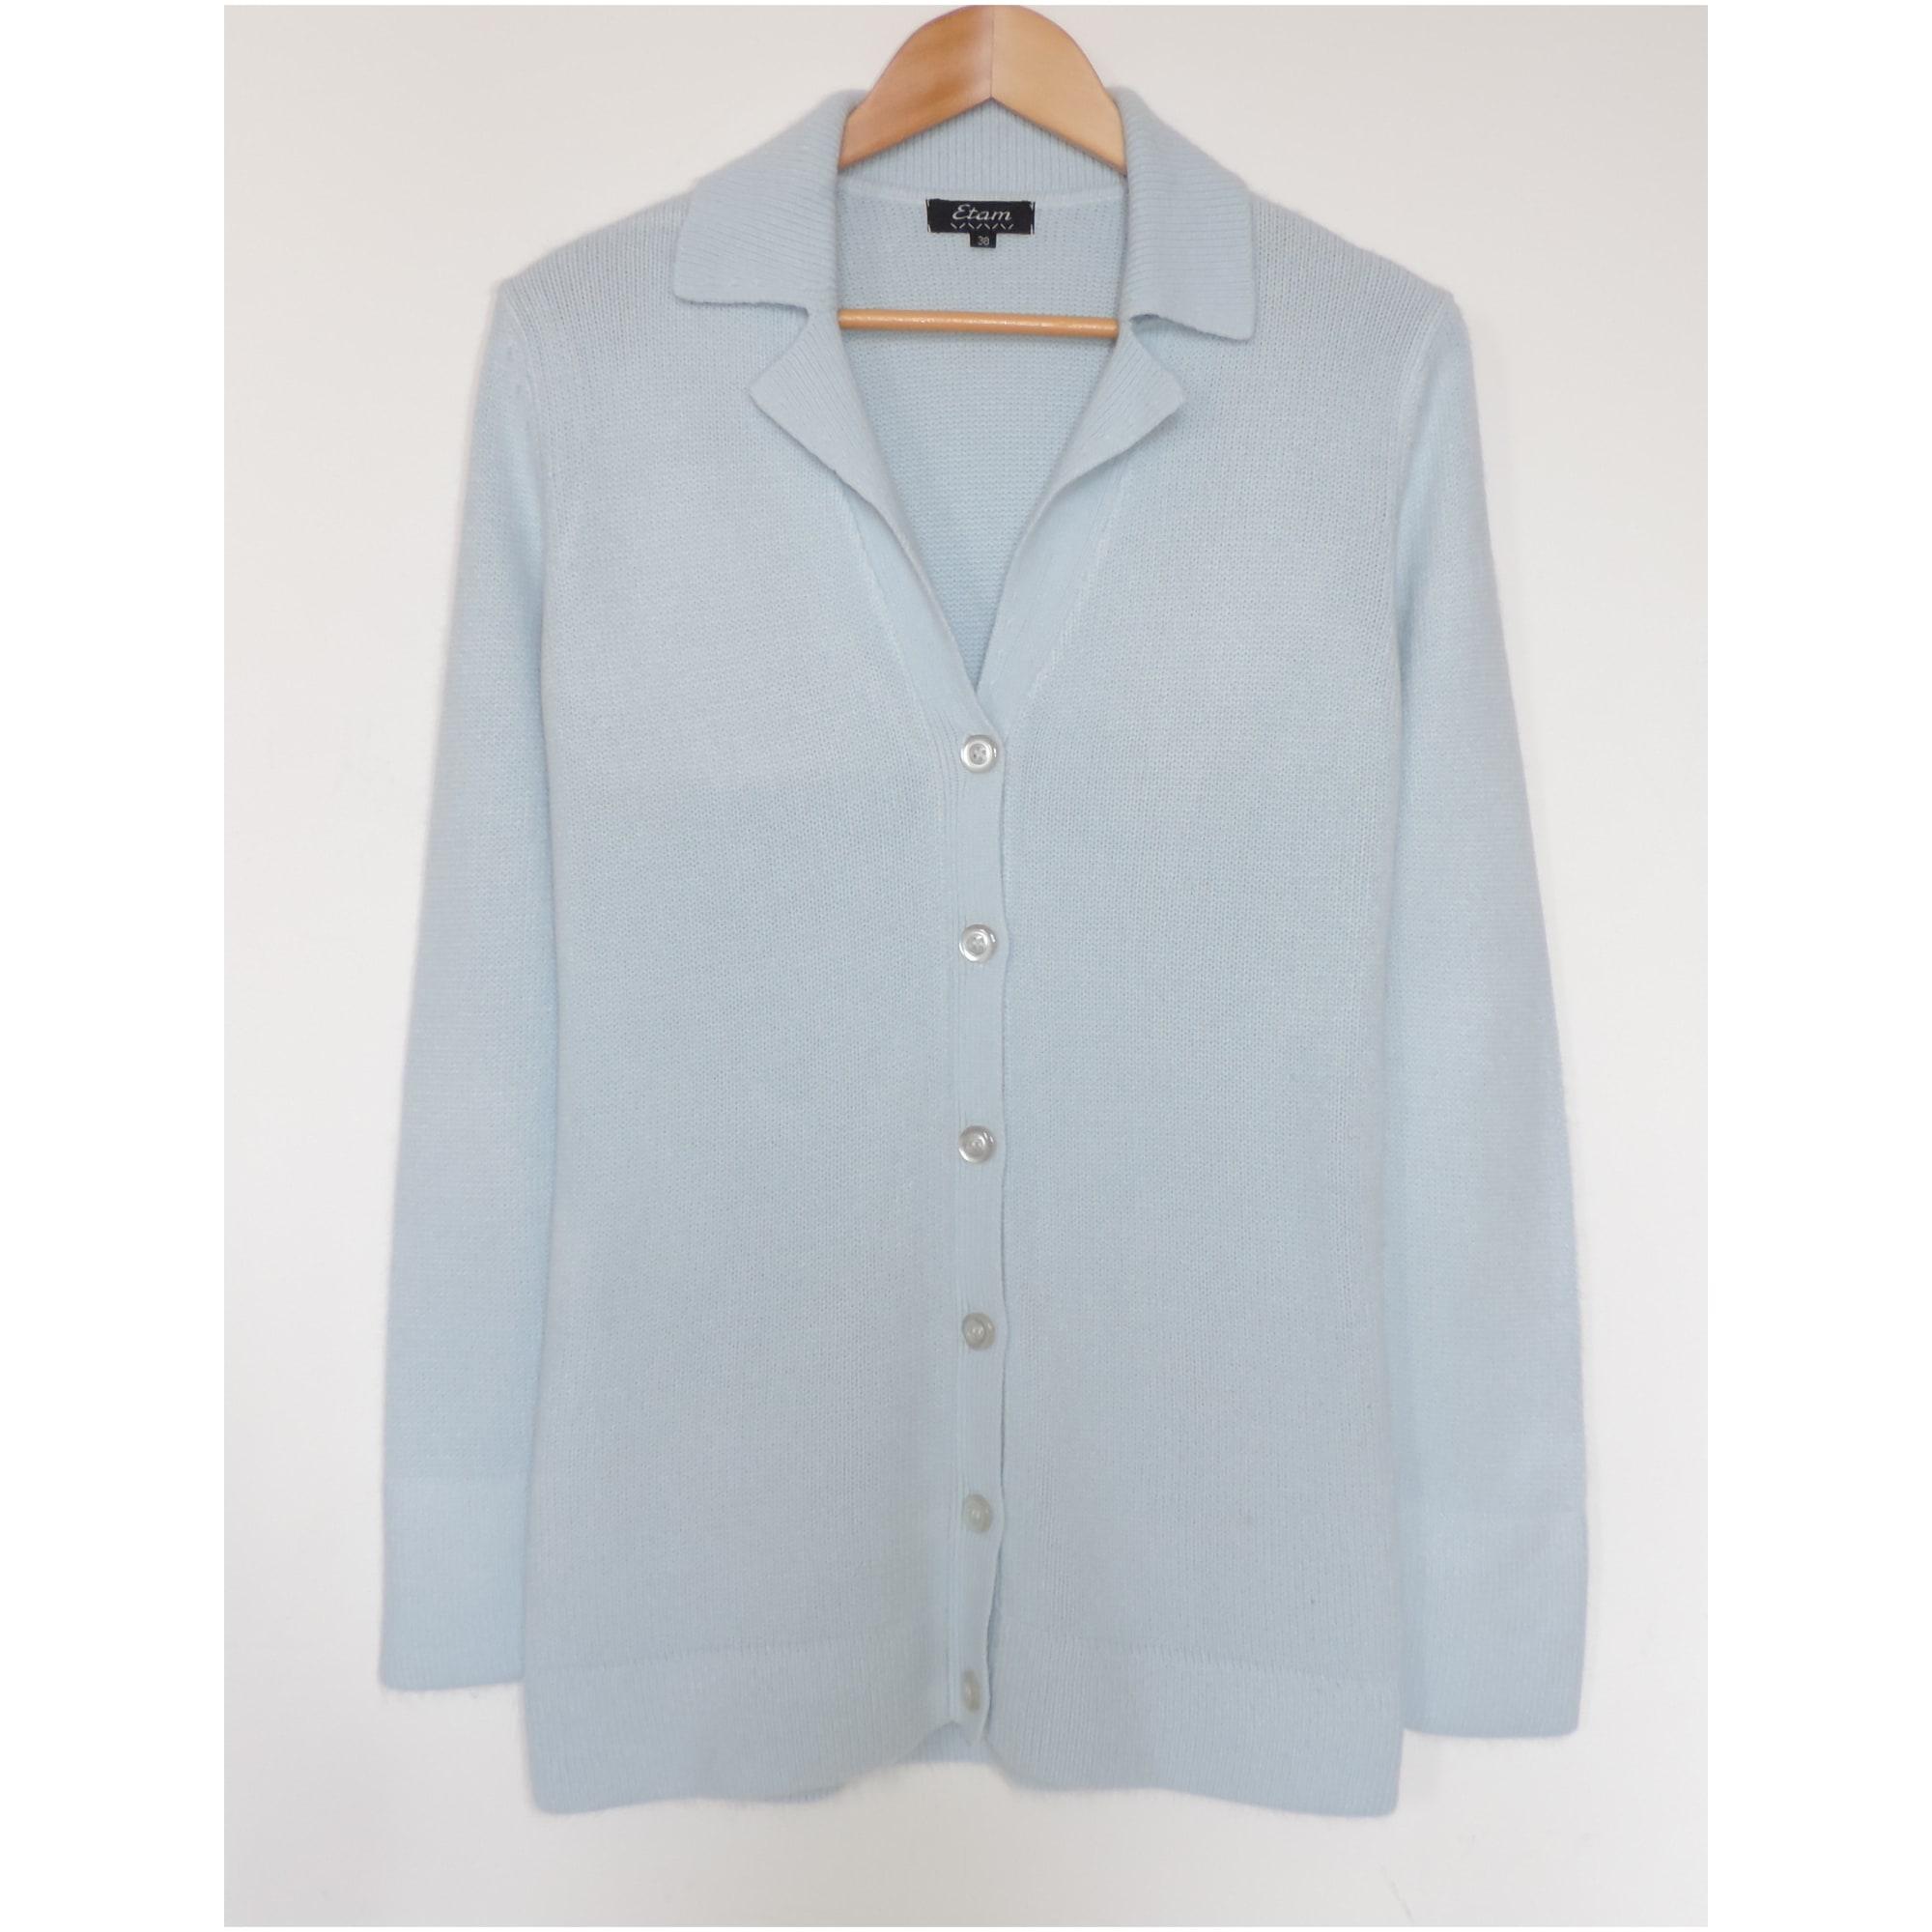 Gilet, cardigan ETAM Bleu, bleu marine, bleu turquoise